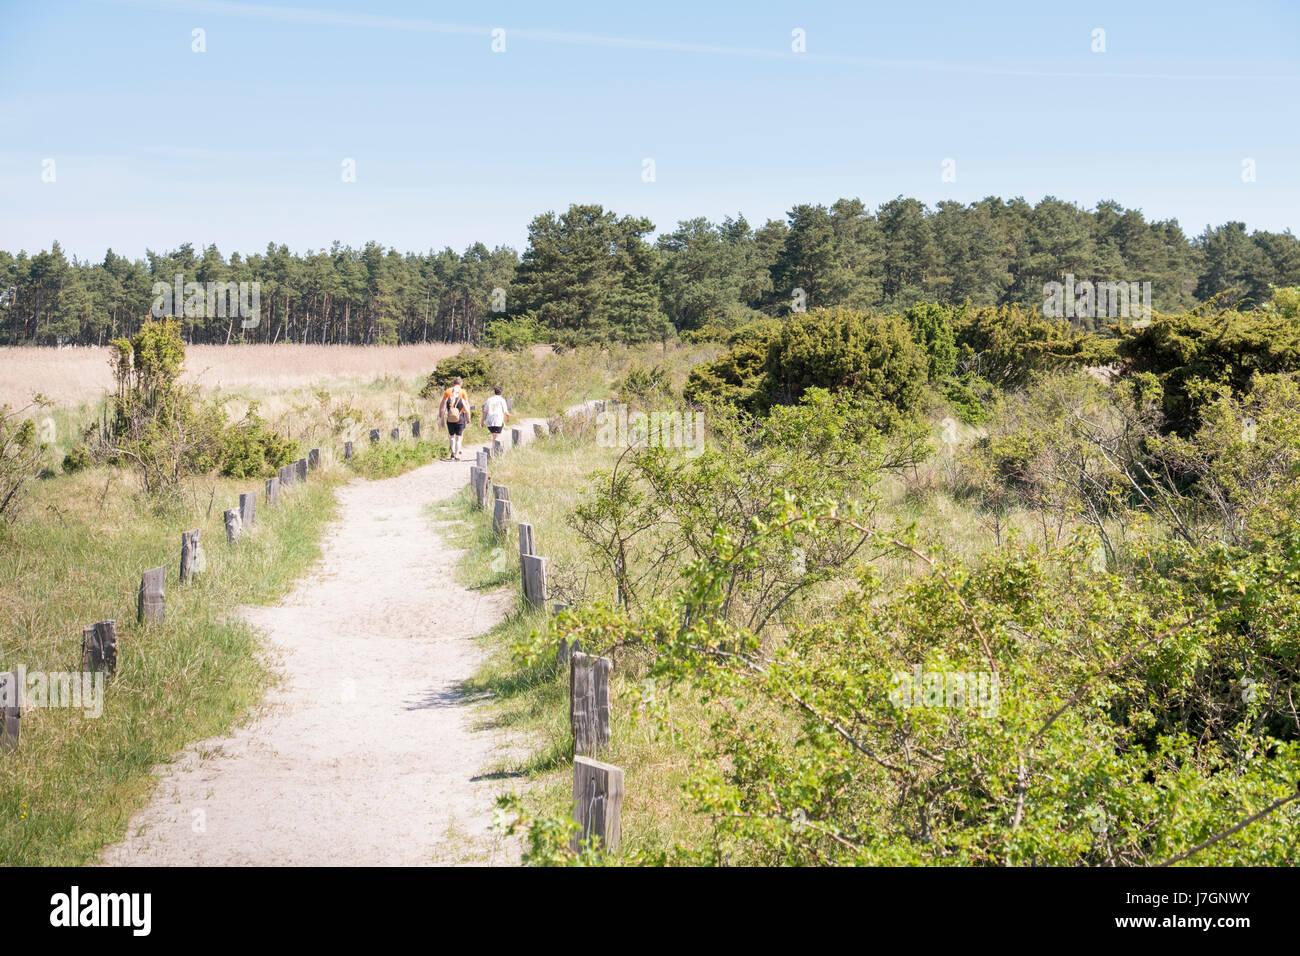 footpath in Darsser Ort at Prerow, Darss, Mecklenburg-Vorpommern, Germany - Stock Image